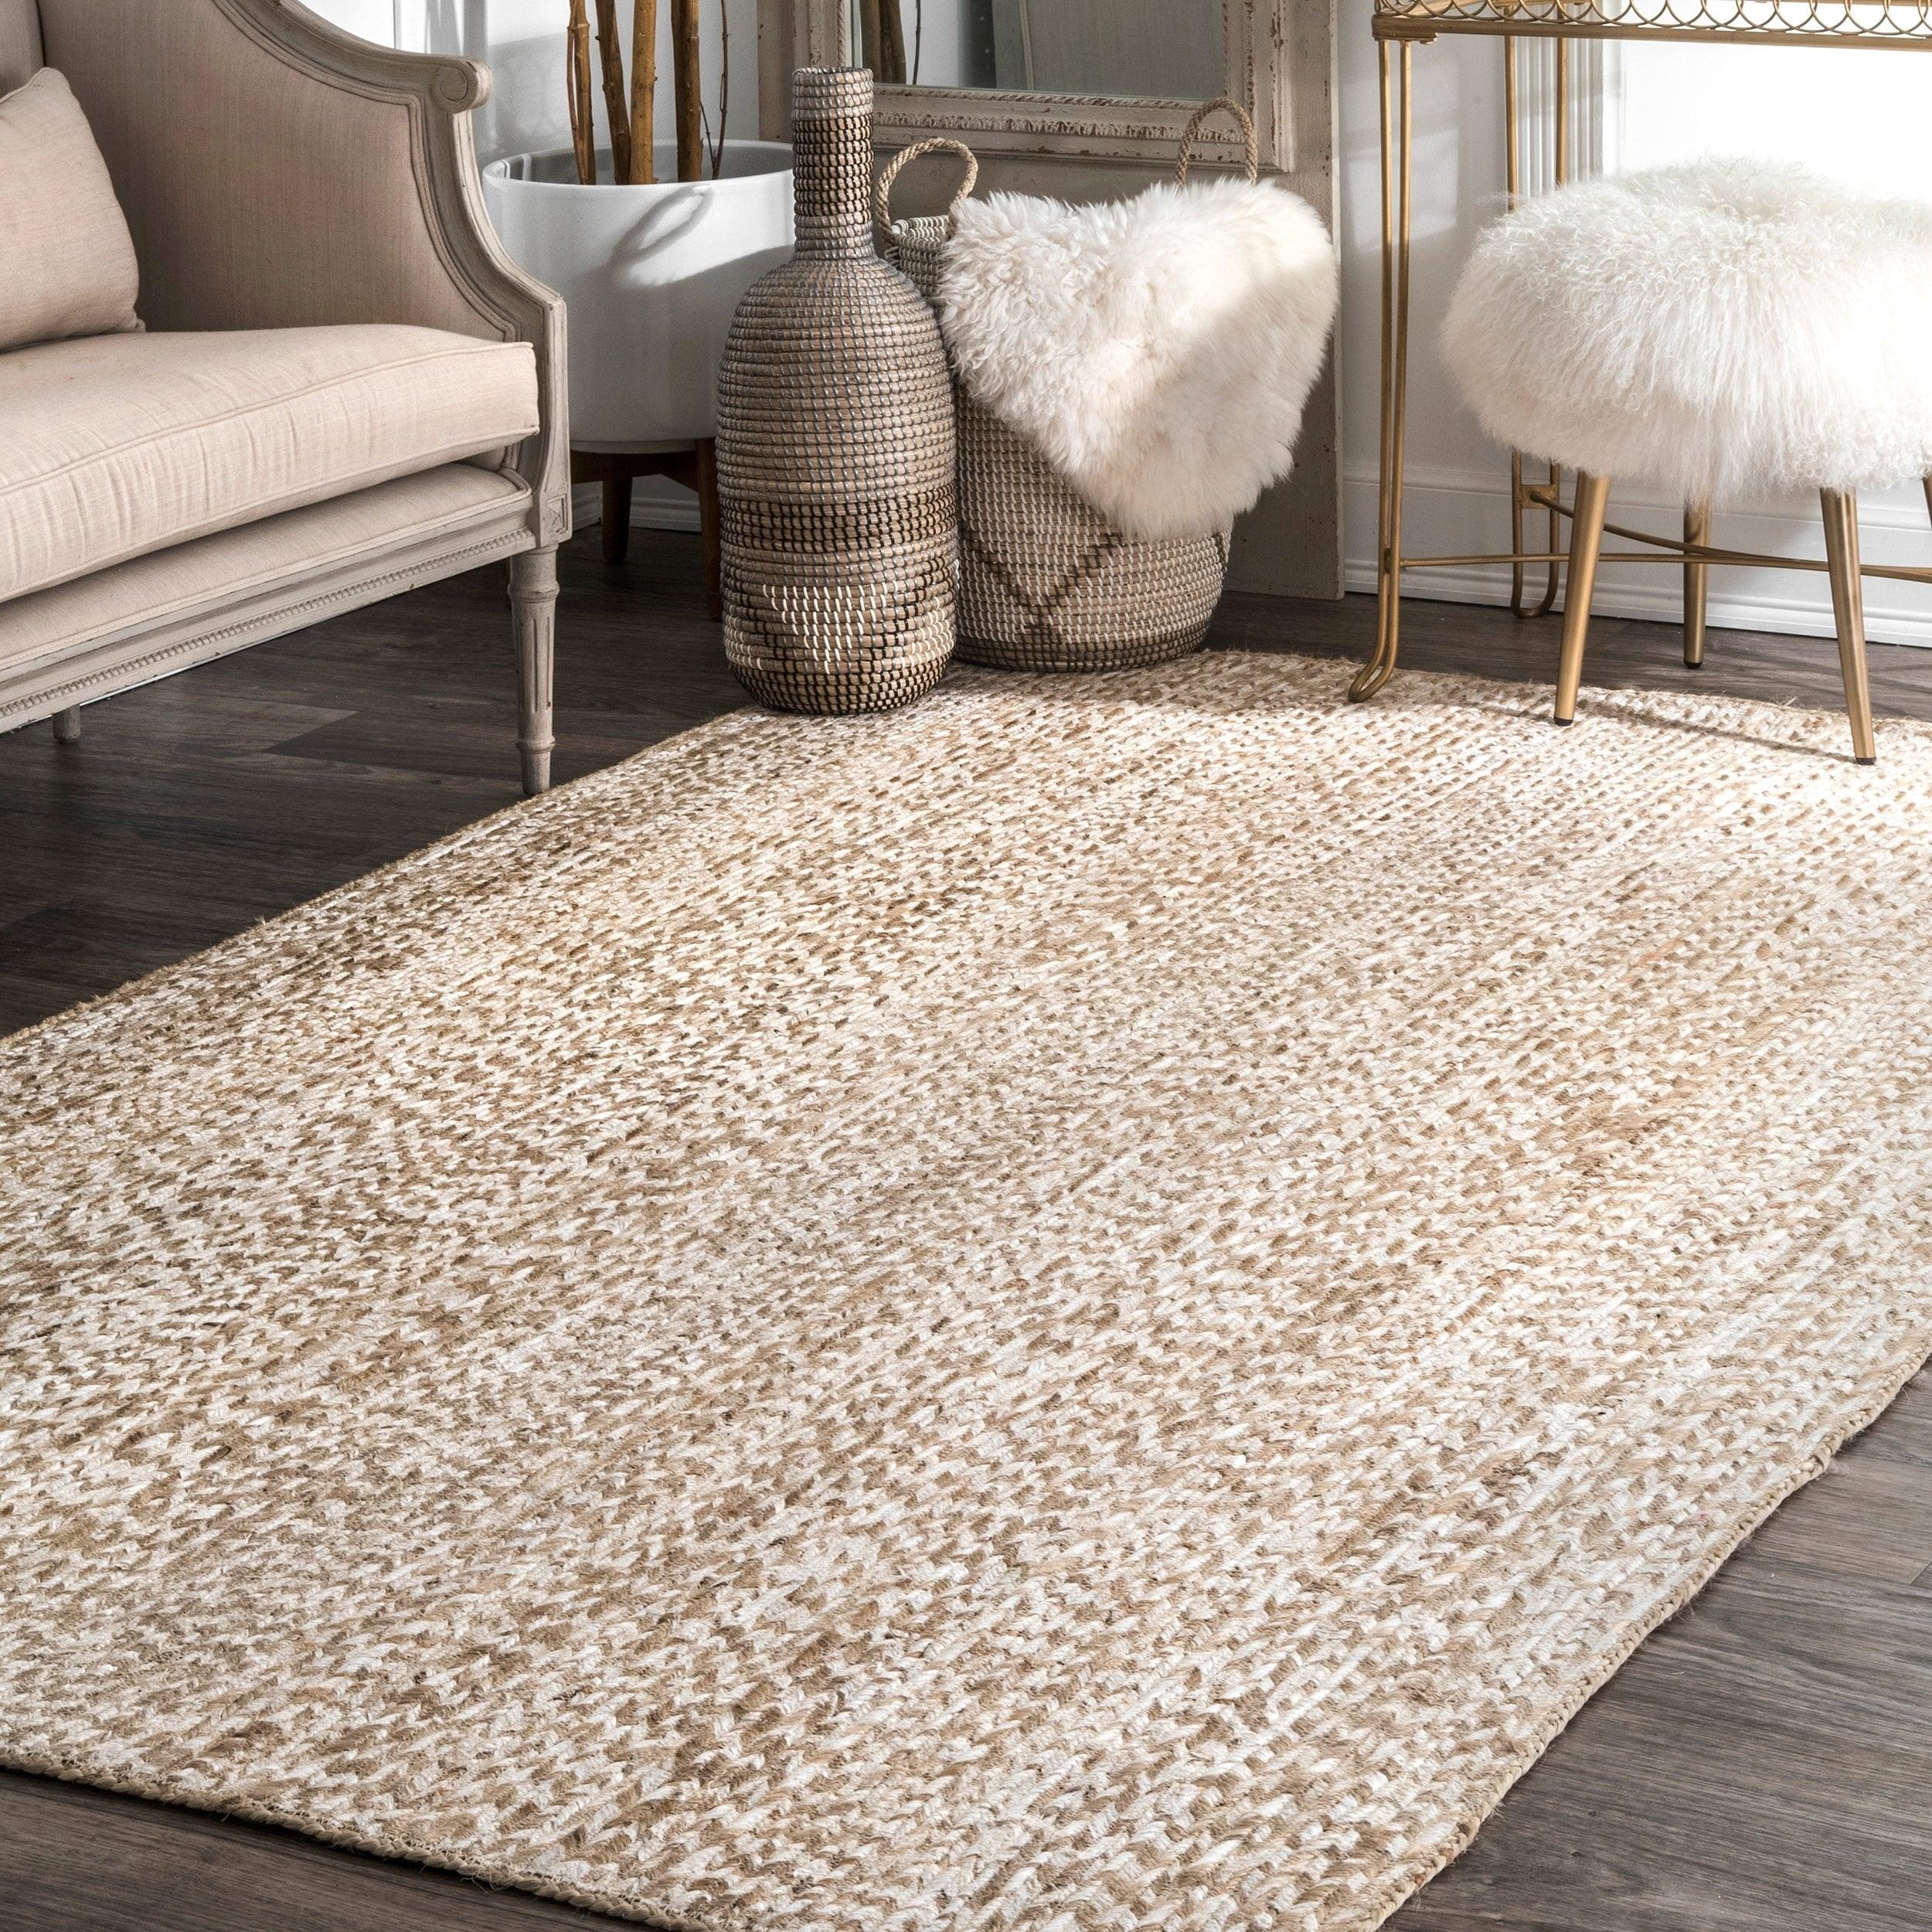 Nuloom Off White Handmade Braided Natural Fiber Jute Cotton Area Rug 7 X27